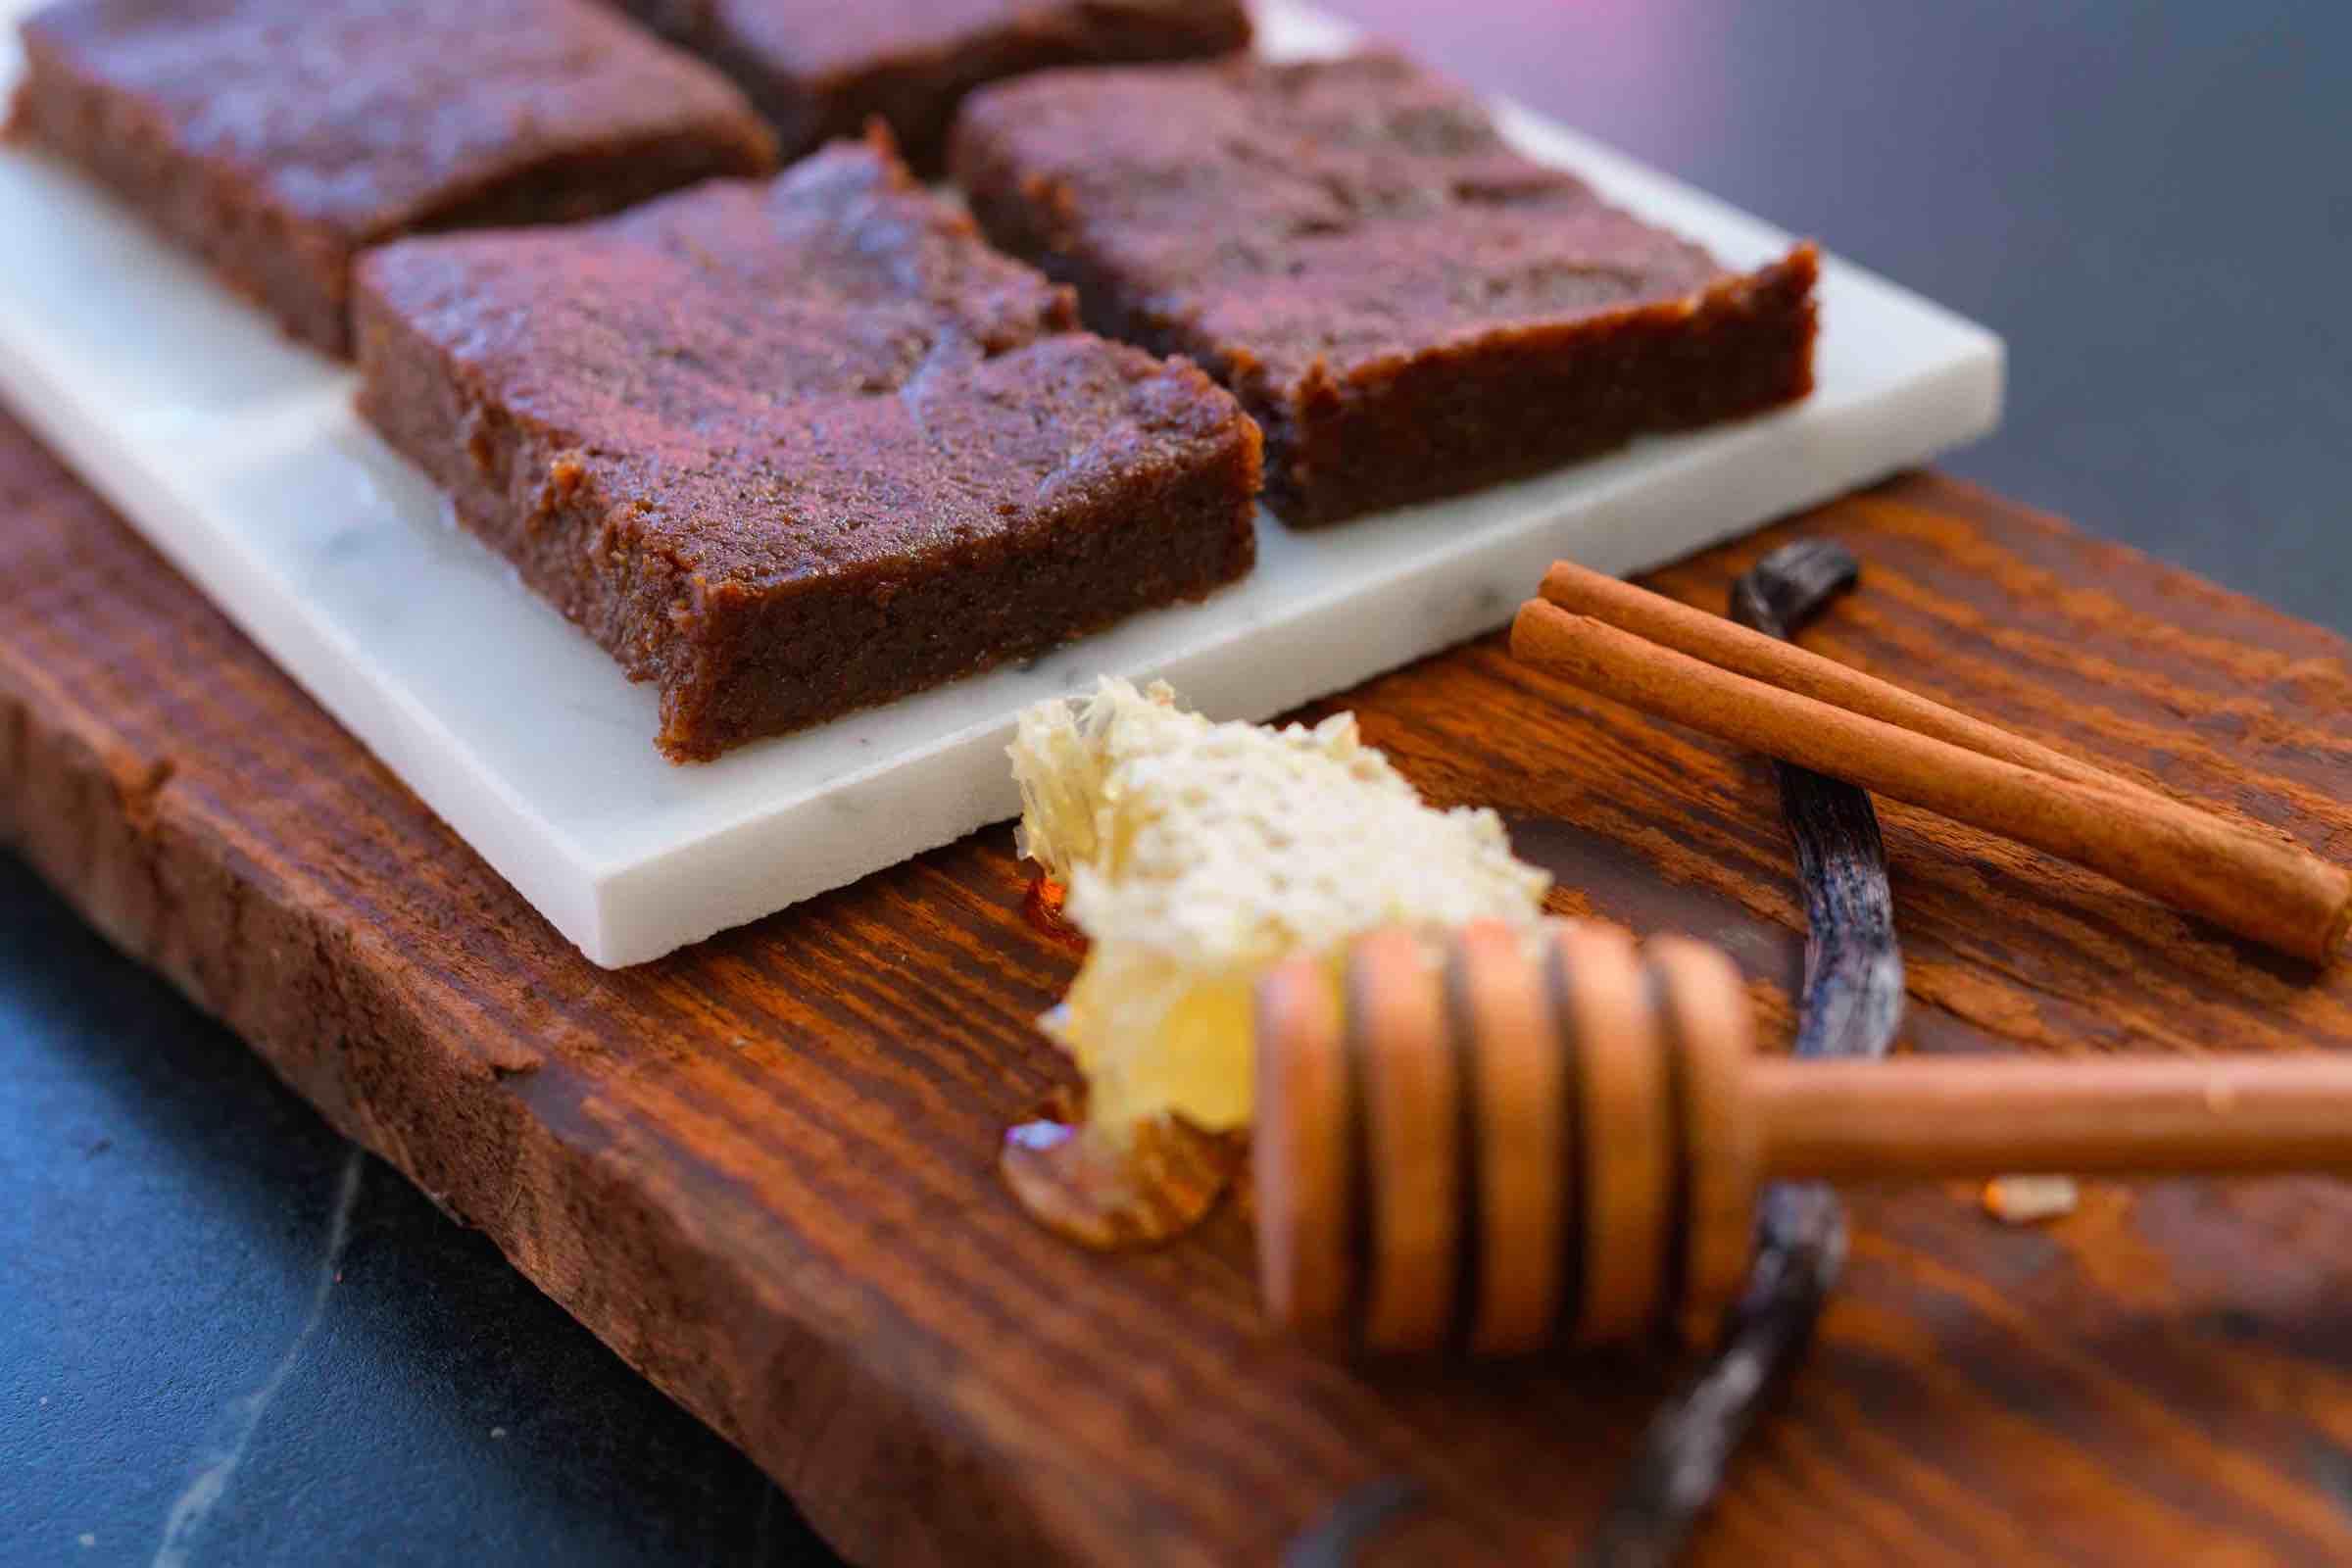 Batchez Peanut Butter Chew and Honey